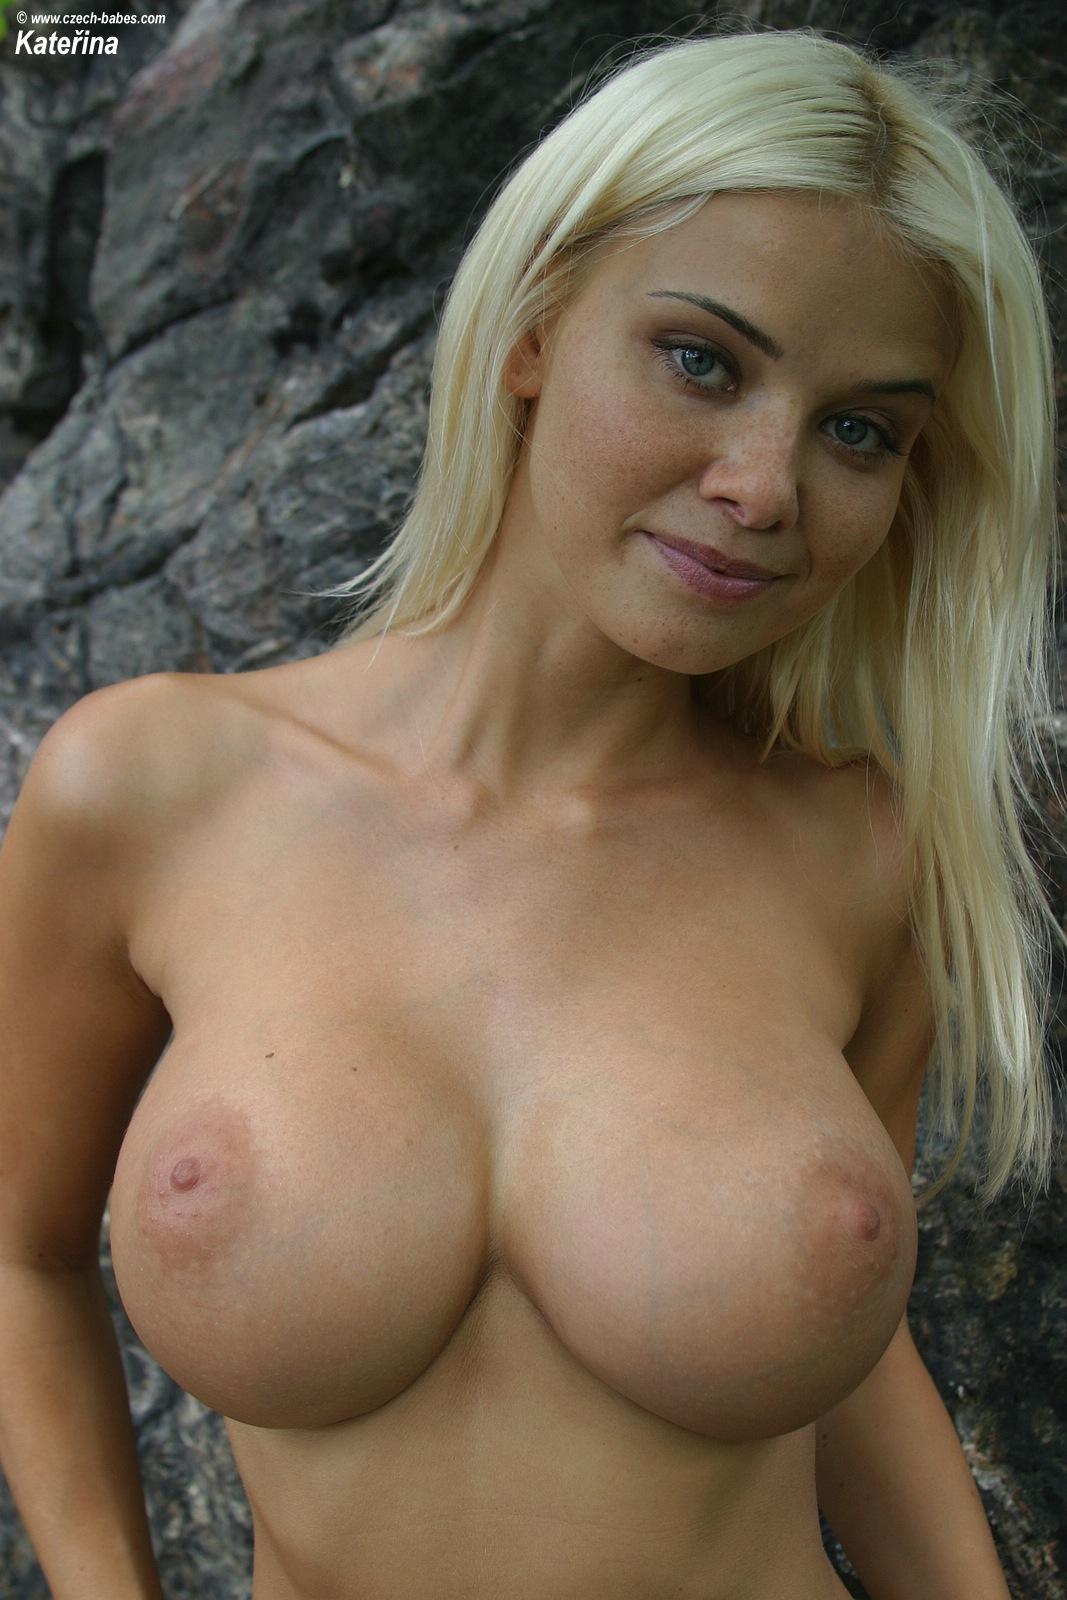 katerina-blonde-boobs-flip-flops-outdoor-naked-20